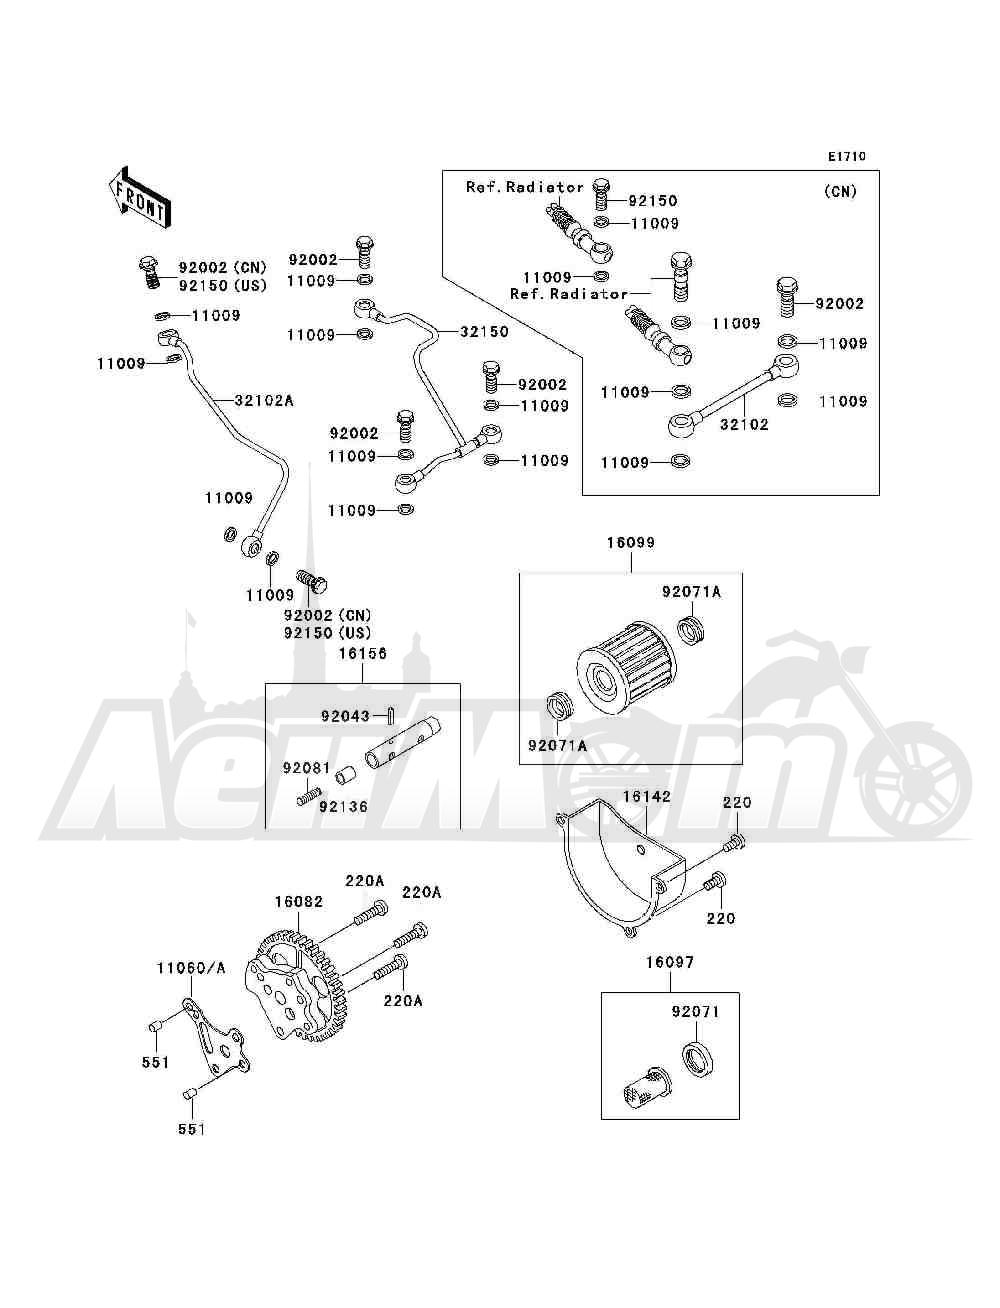 Запчасти для Квадроцикла Kawasaki 1993 BAYOU 300 4X4 (KLF300-C5) Раздел: OIL PUMP / OIL FILTER | маслянный насос/масляный фильтр